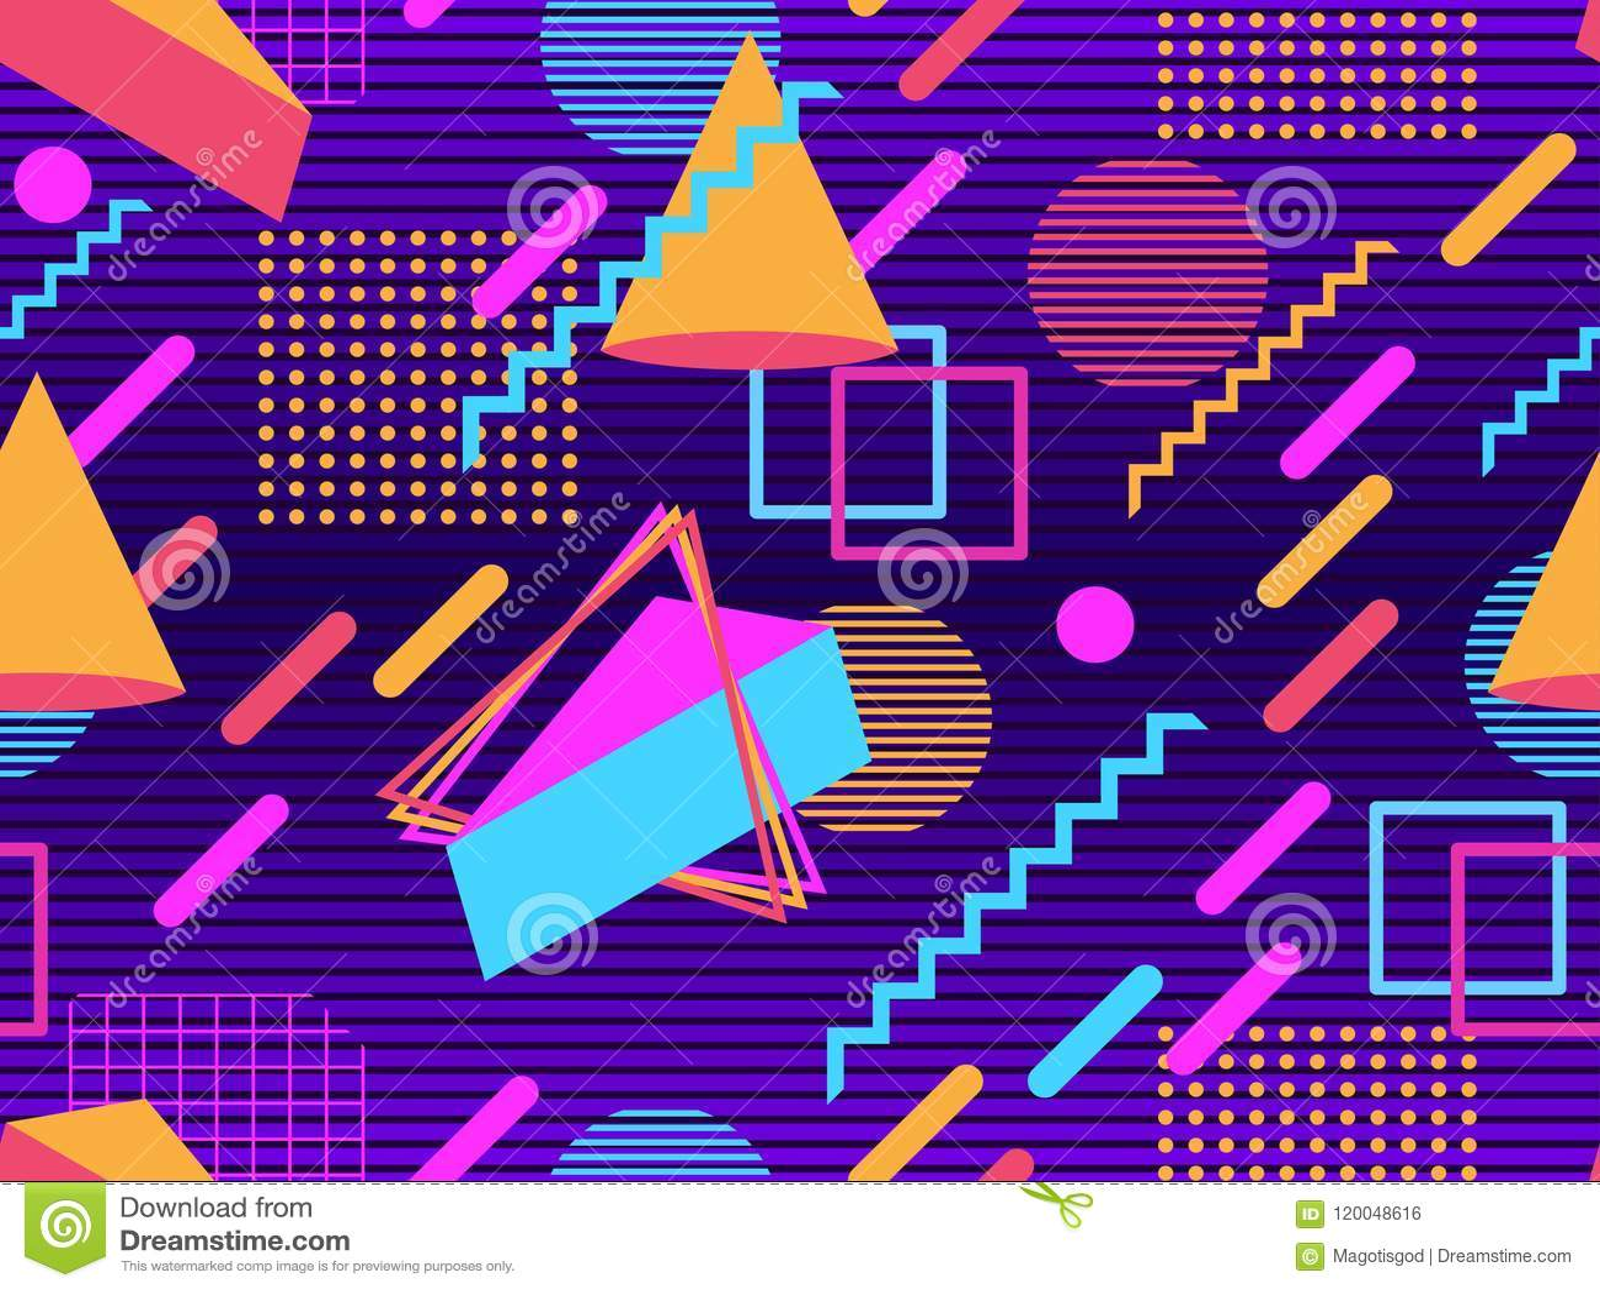 Retro Futurism Seamless Pattern  Geometric Elements Memphis